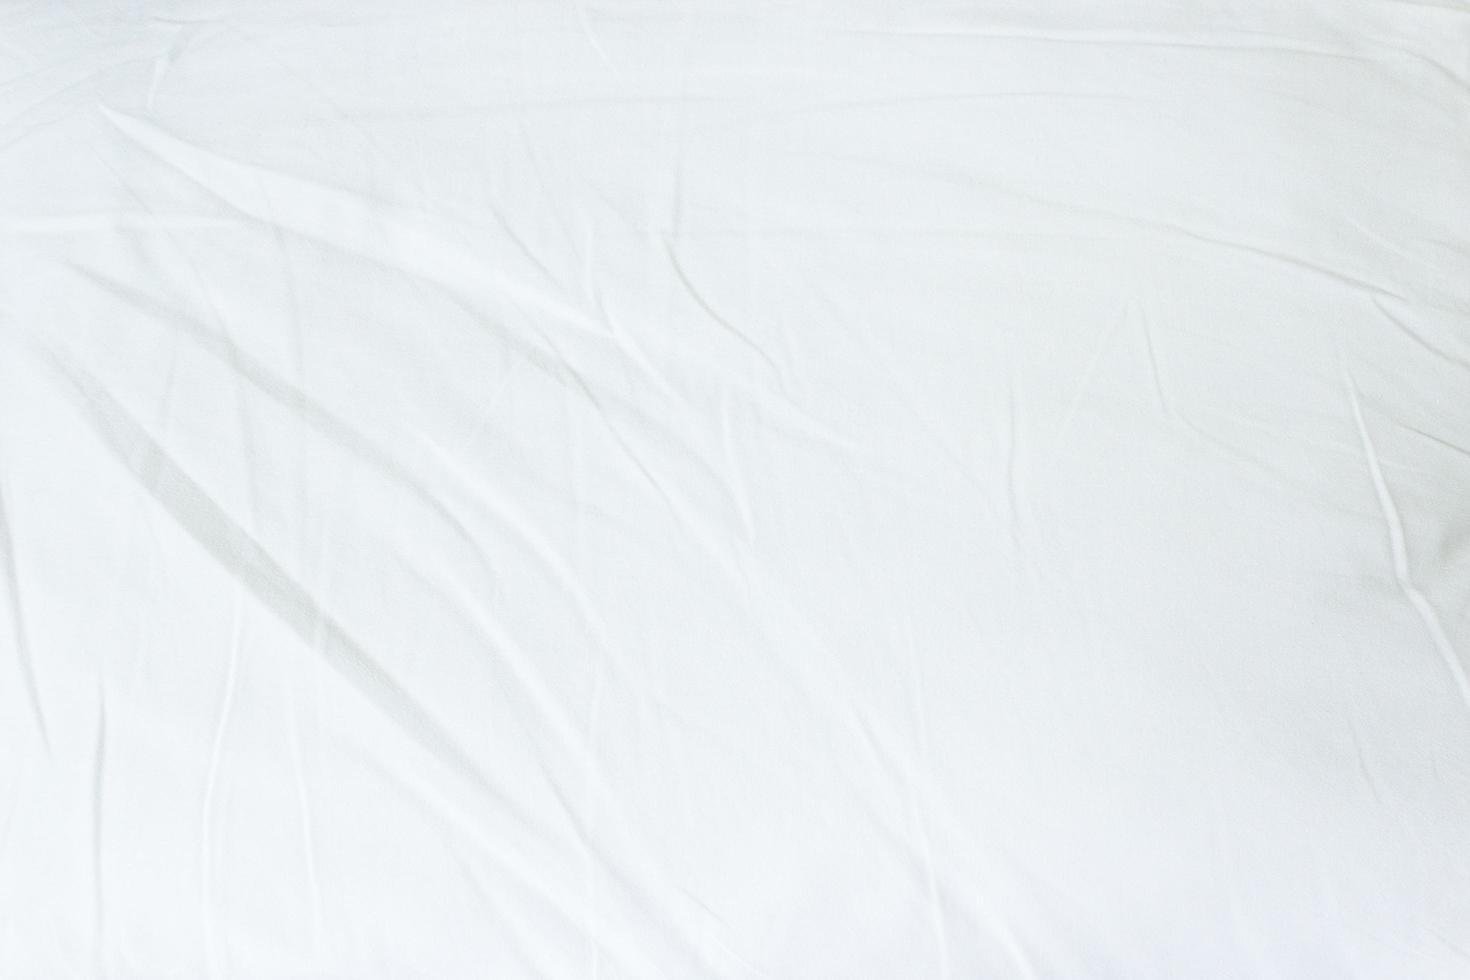 fond de tissu blanc photo